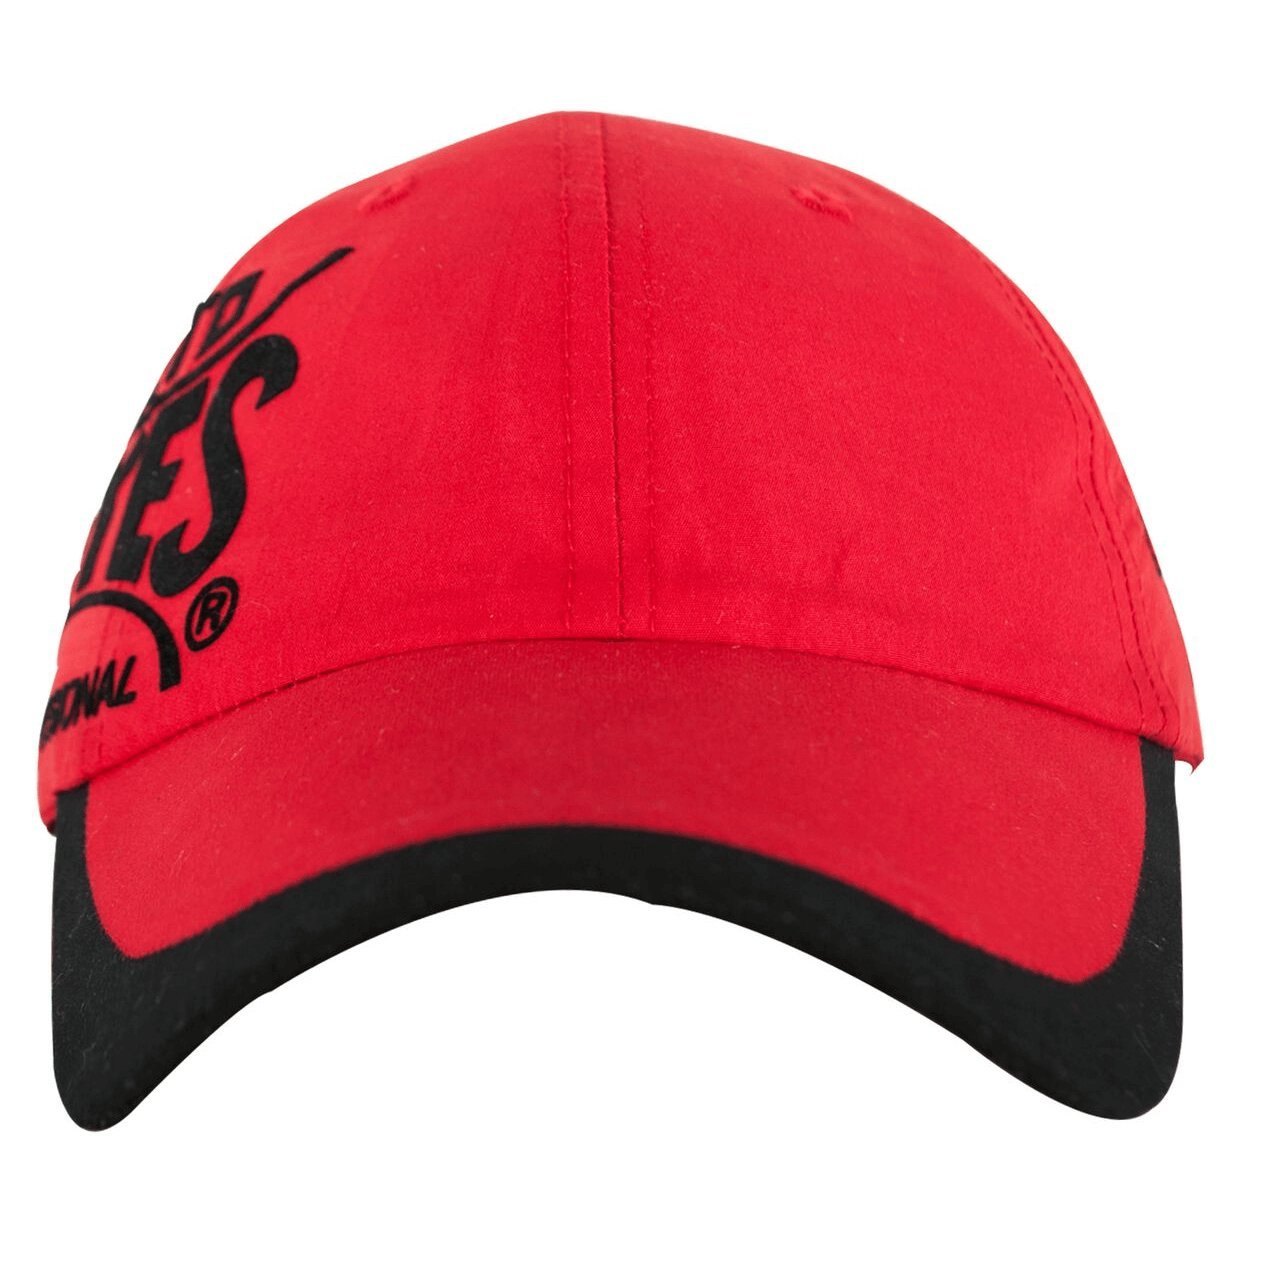 Cleto Reyes C850 Gorra, Hombre, Rojo, U